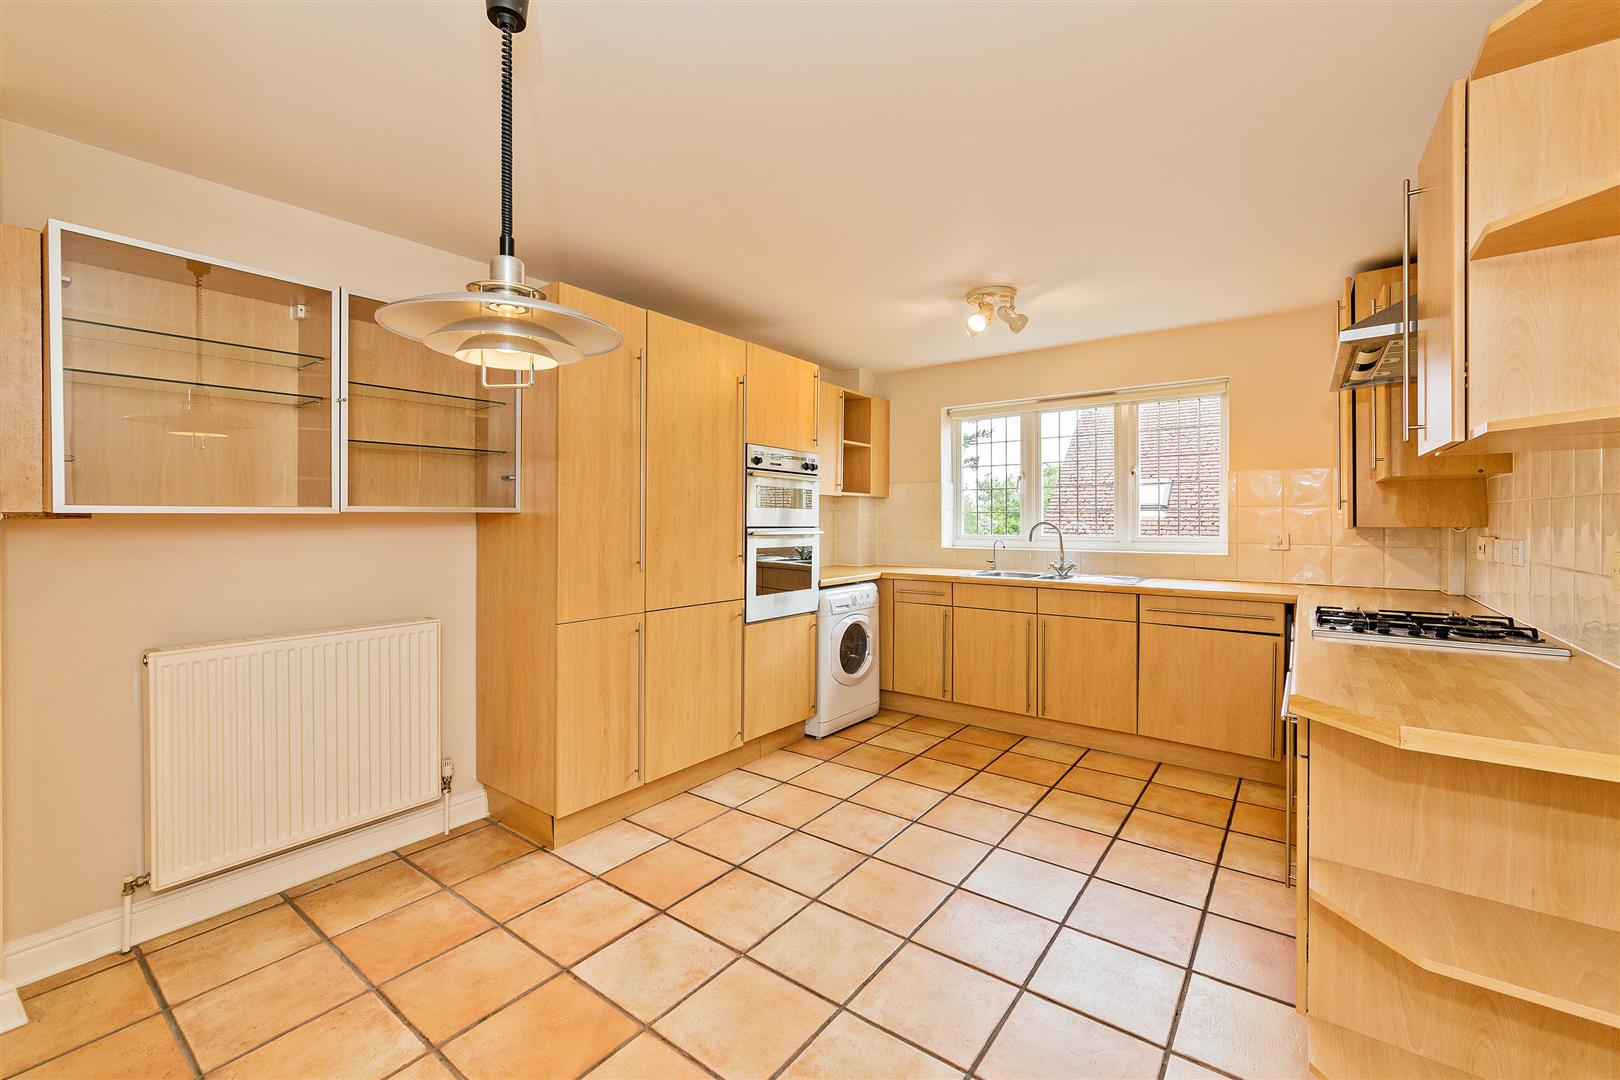 8 Marlborough House  (8) - kitchen use.jpg